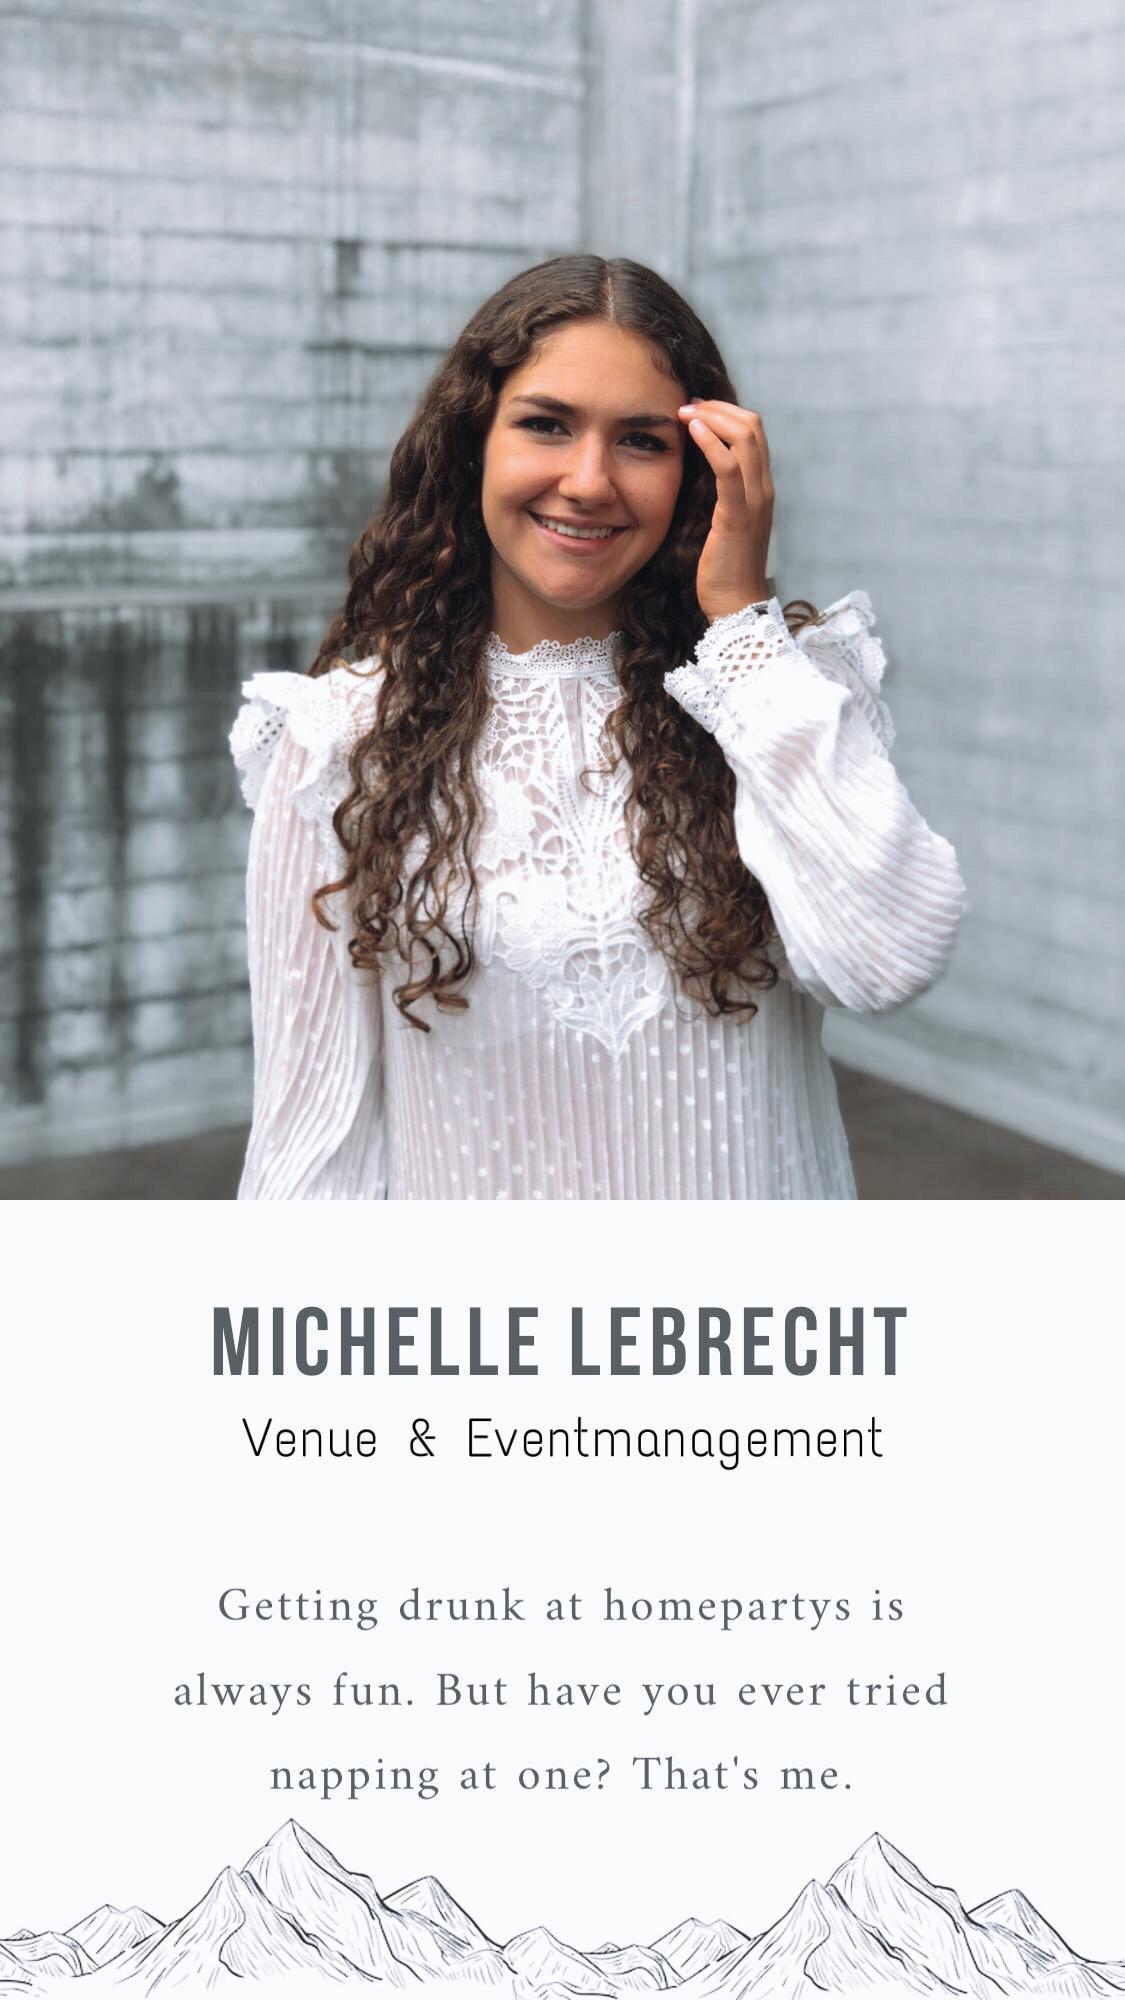 Venue; Michelle Lebrecht.jpg